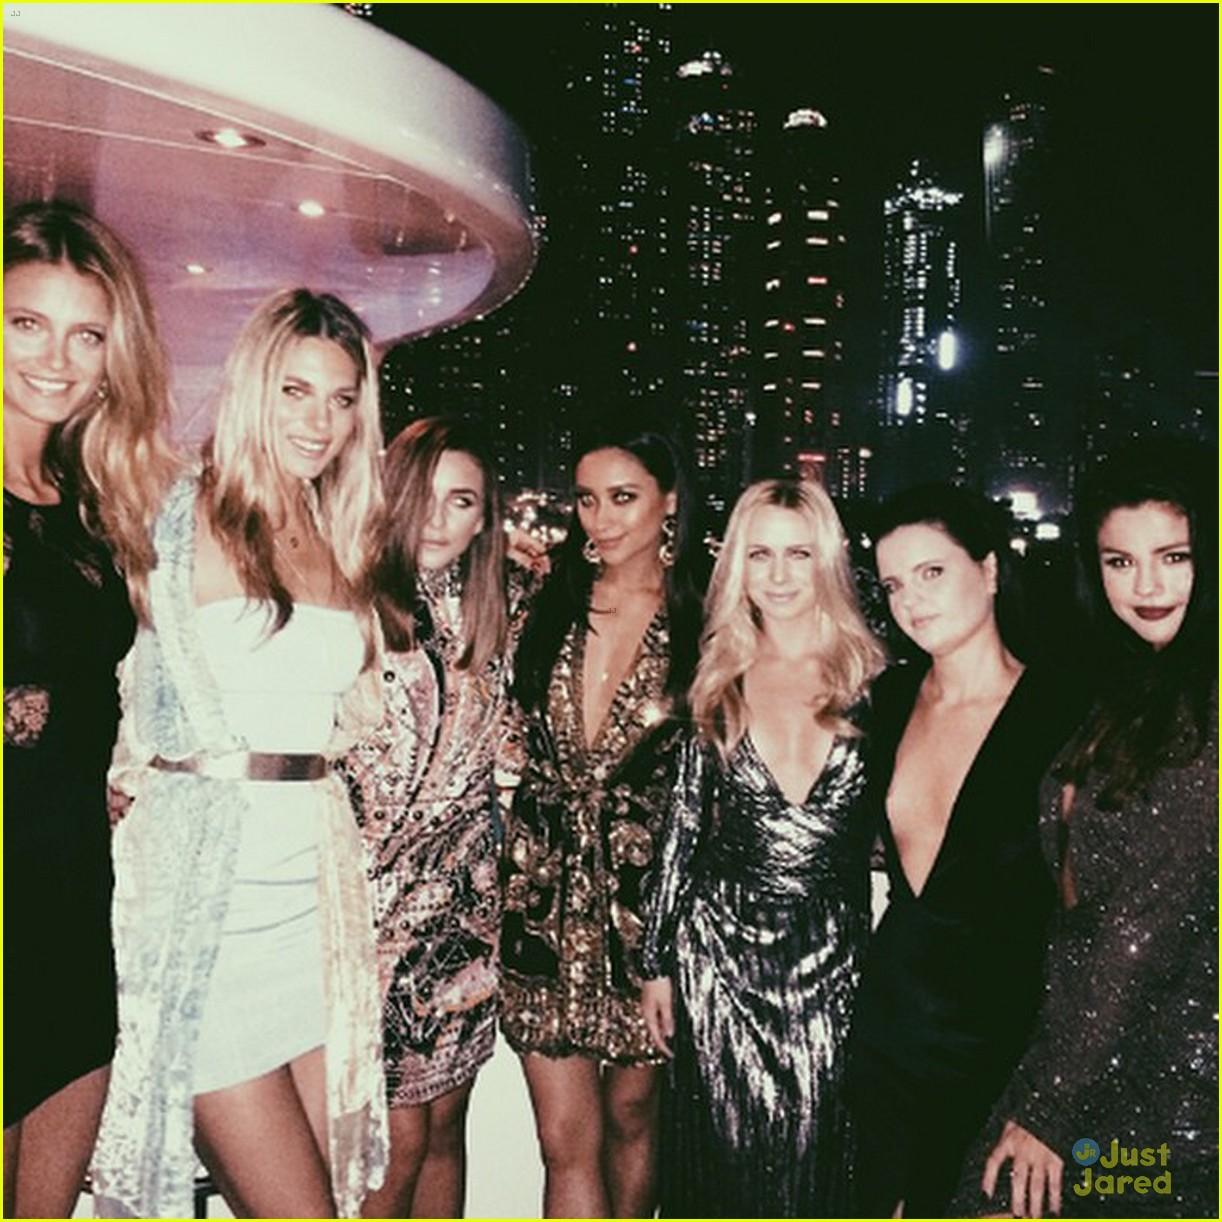 Selena Gomez Spanks Gigi Hadid At 2015 Victoria's Secret ...   Gigi Hadid And Selena Gomez